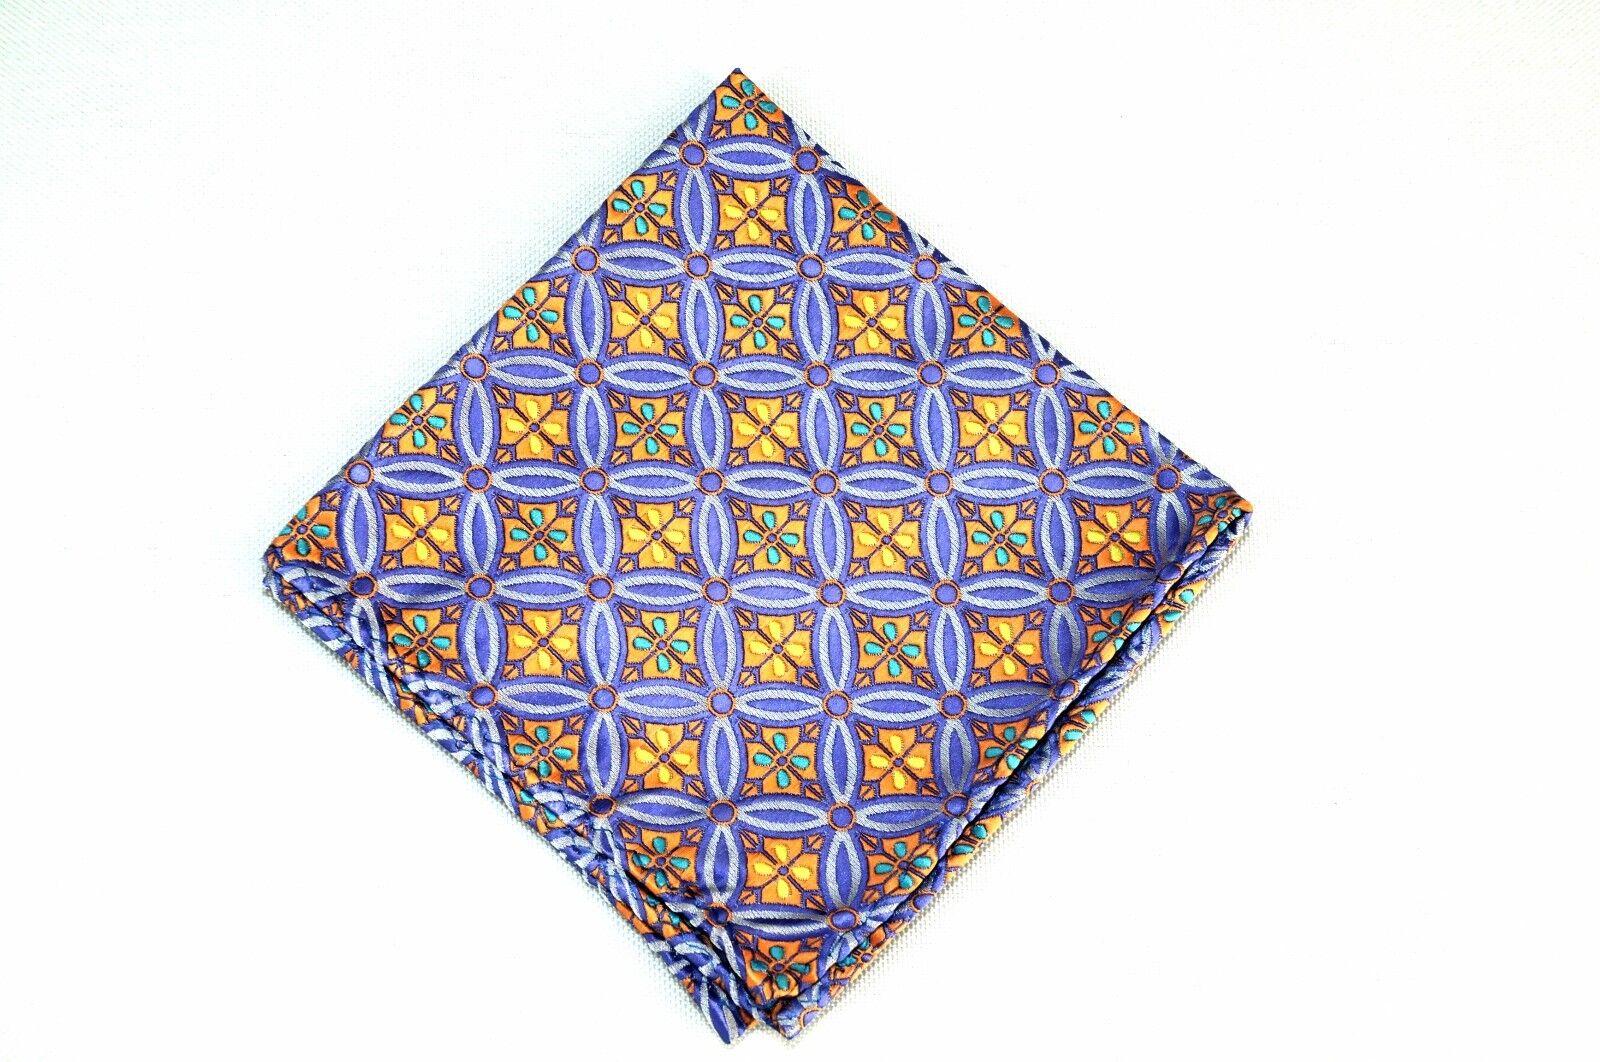 Lord R Colton Masterworks Pocket Square Salvador Amathyst Silk - Retail New